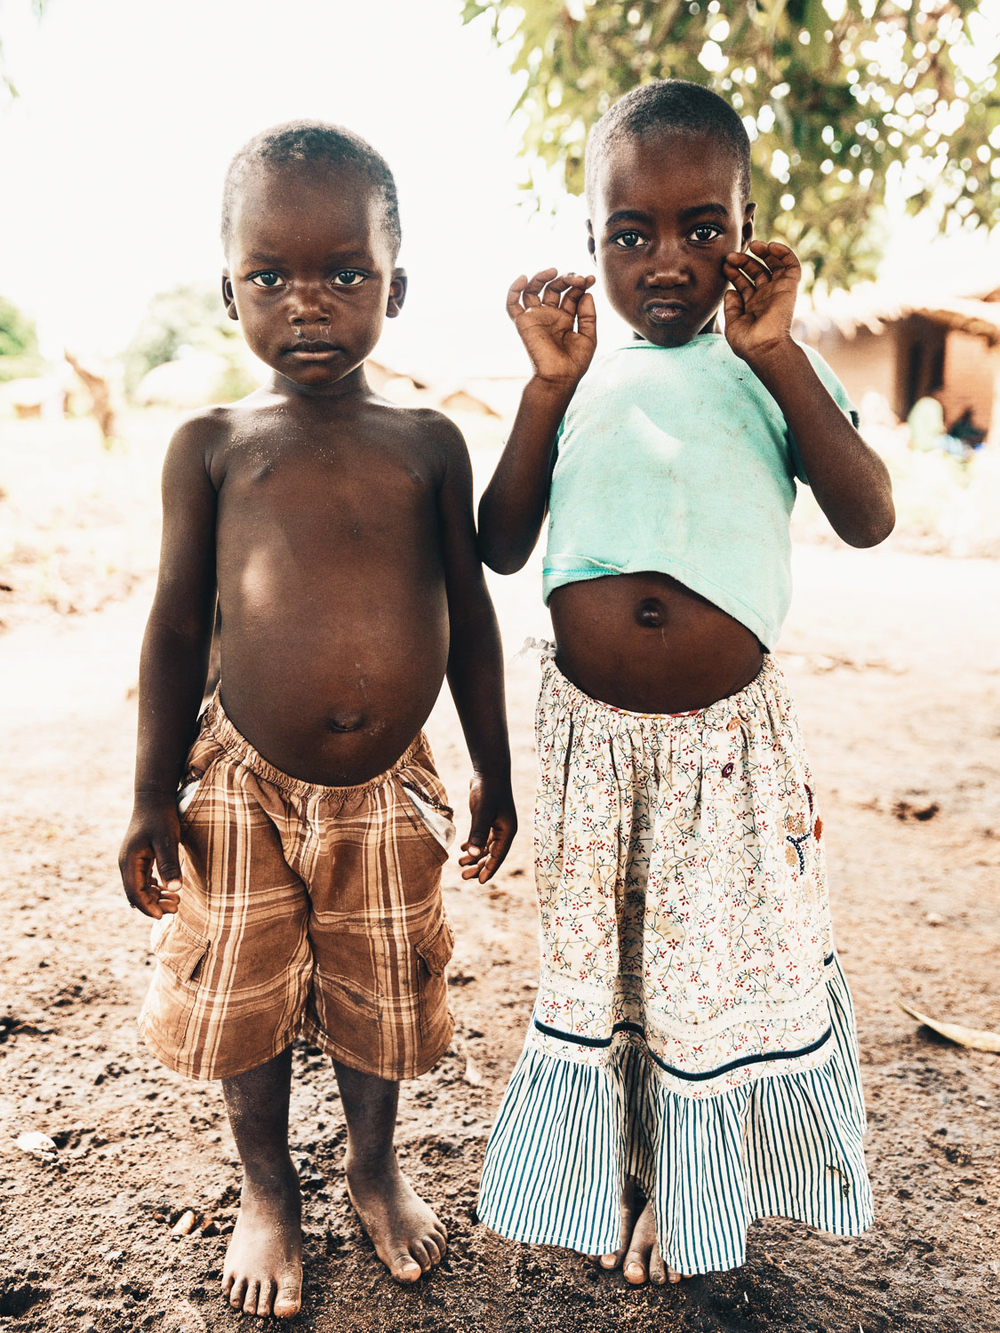 CallieGiovanna_Africa_Malawi_Chitimba_20150101_06199.jpg